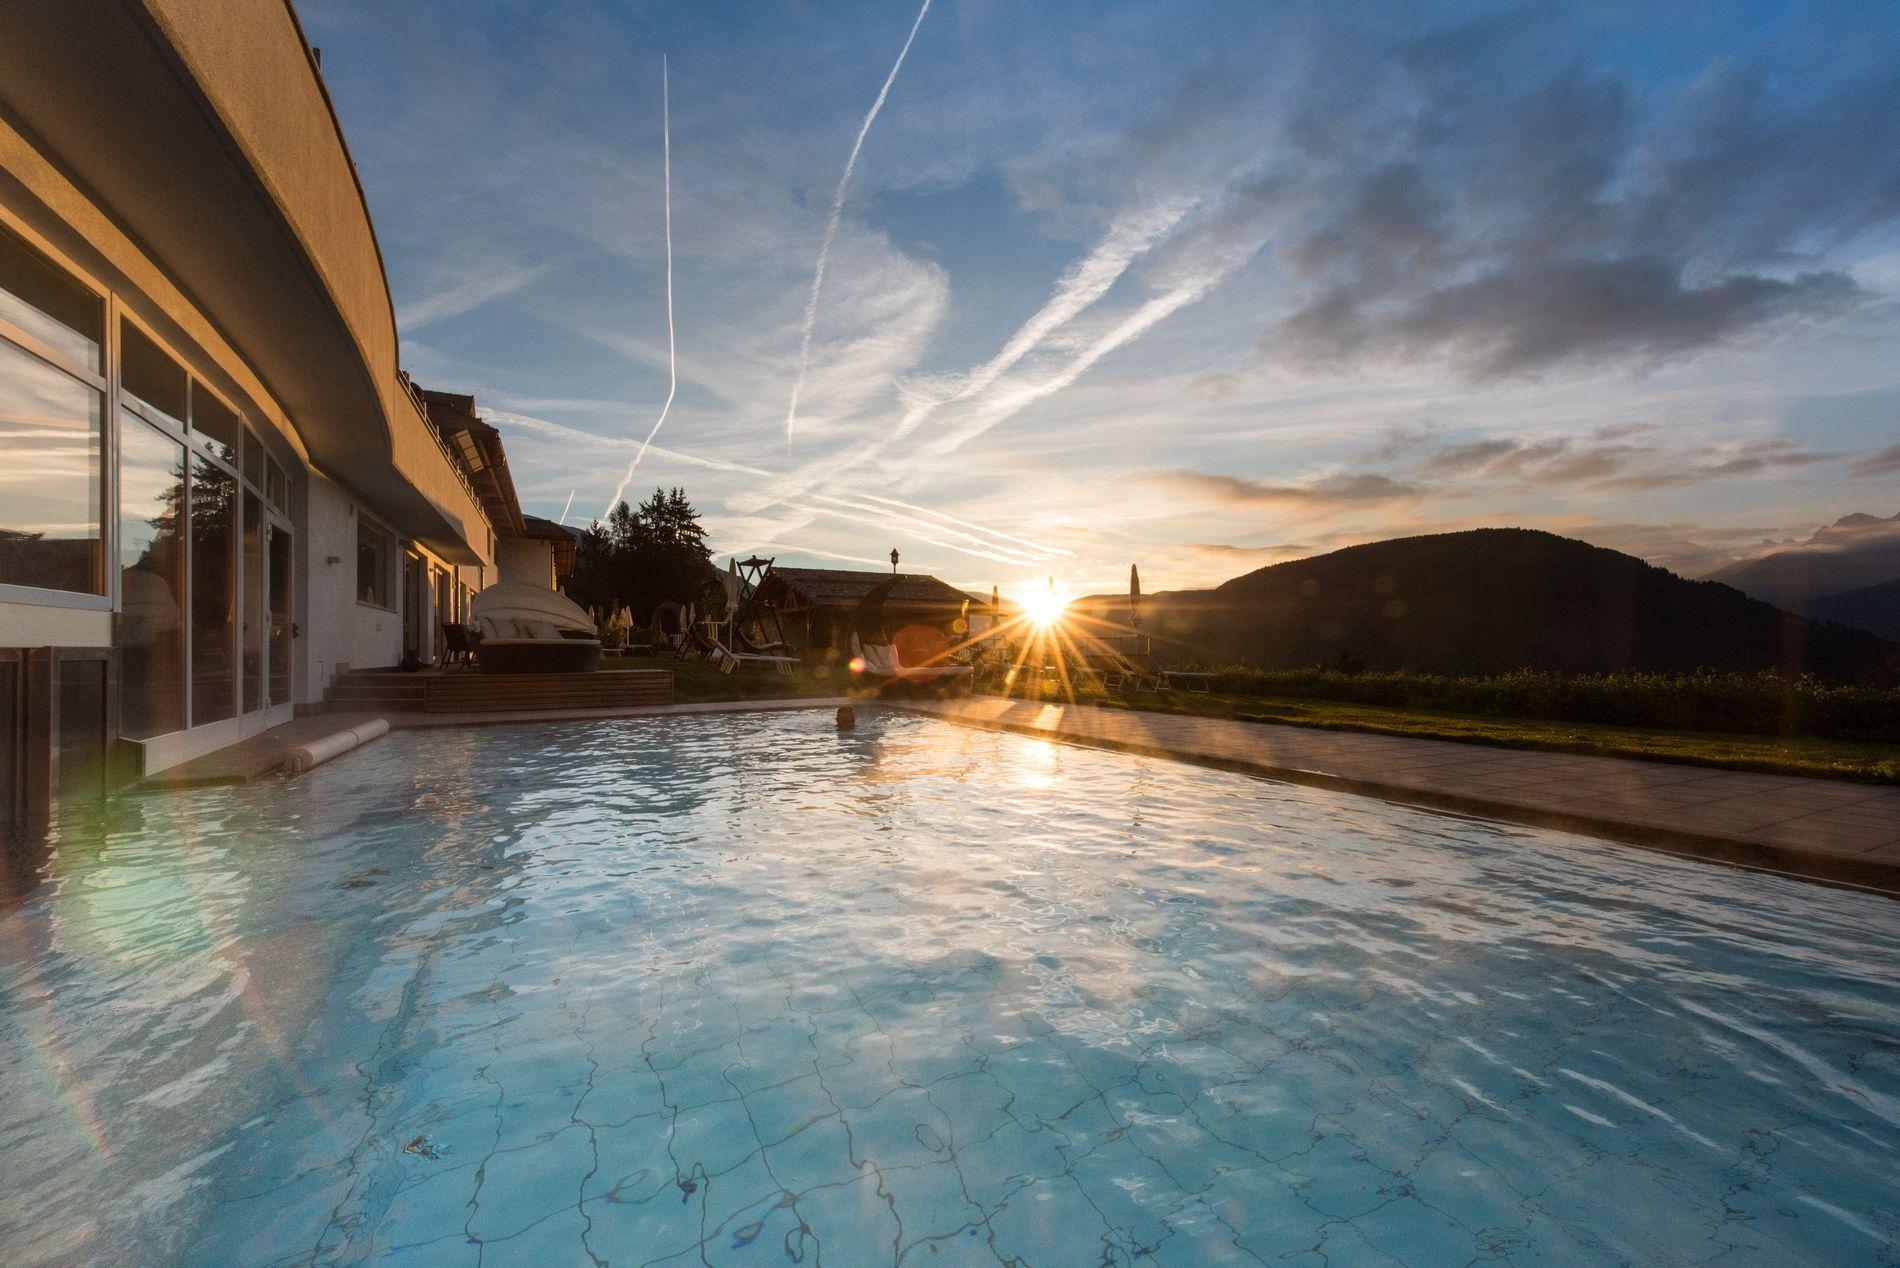 Dolomiten Hotel Wellness